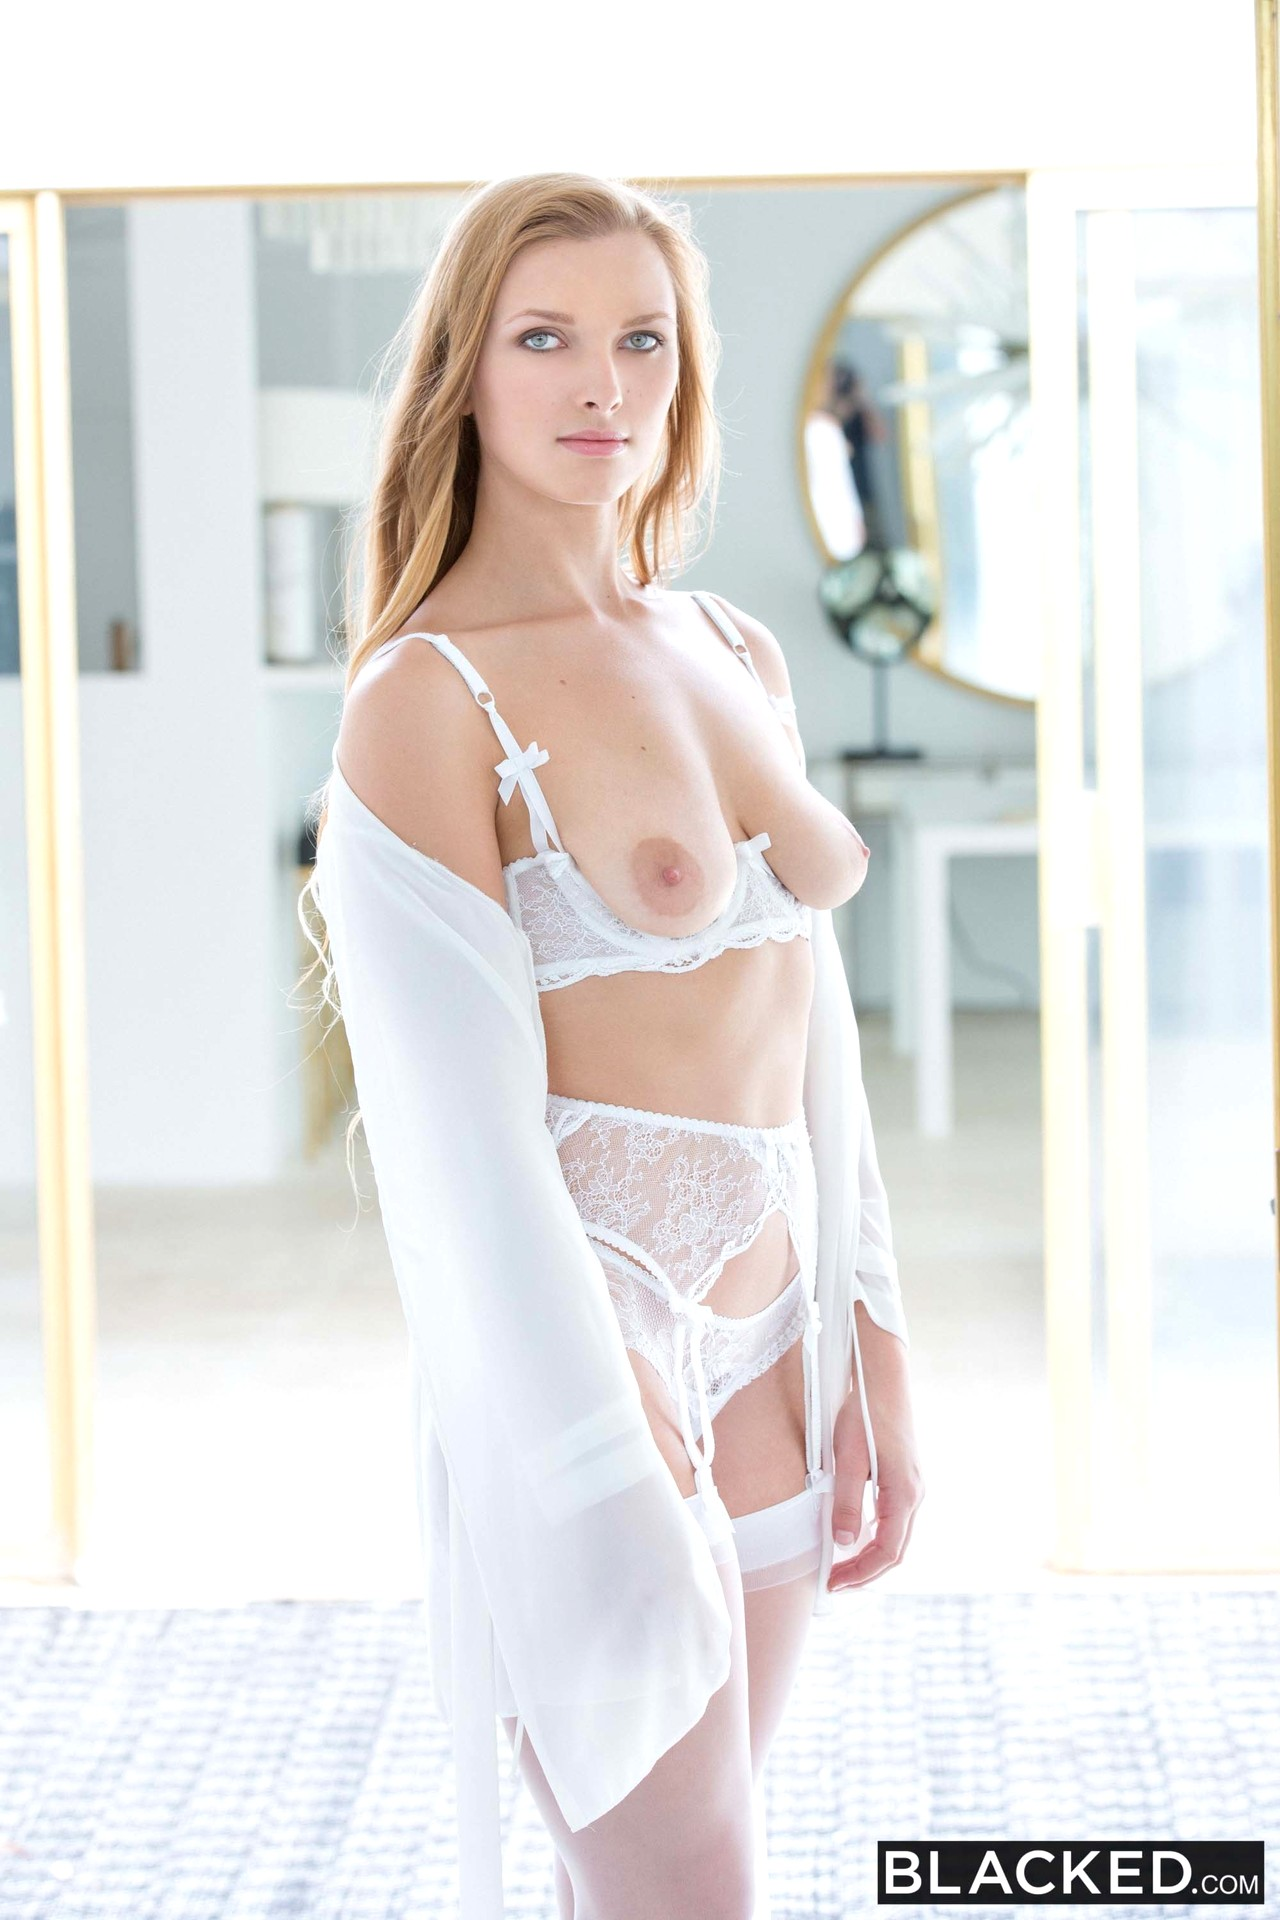 Babe Today Blacked Layna Landry Extreme Blowjob Tweet Porn-5037